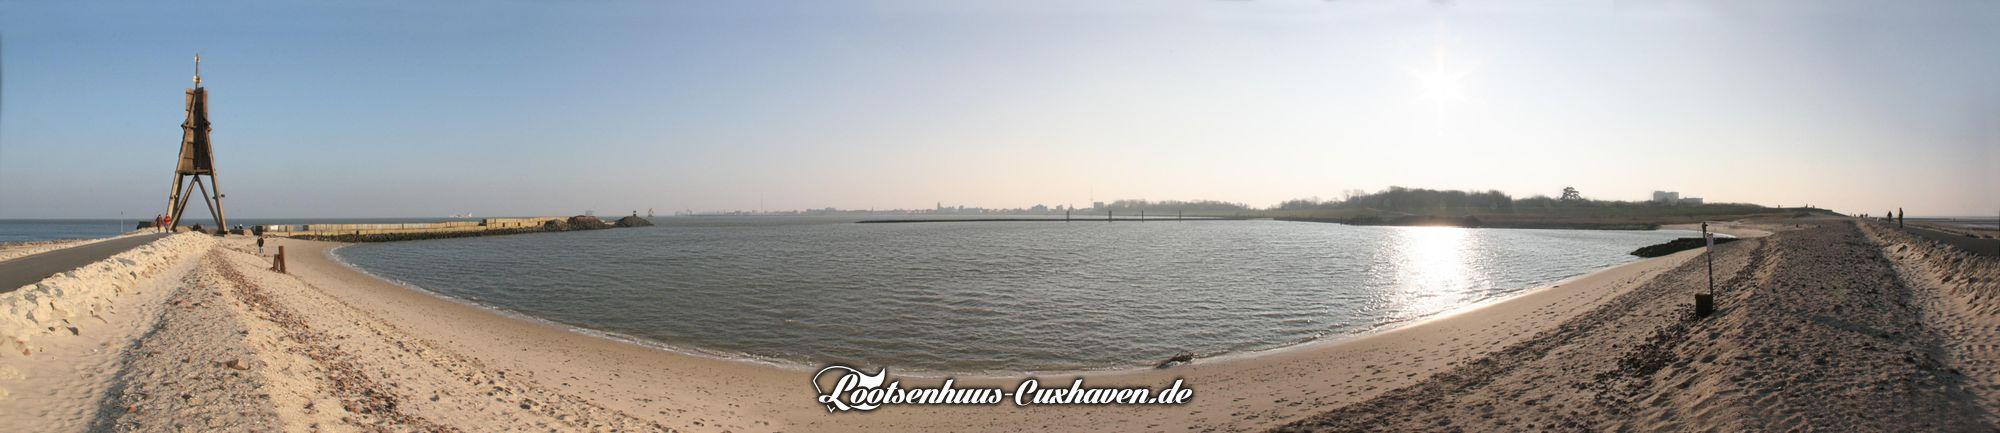 Cuxhaven Kugelbake Panorama